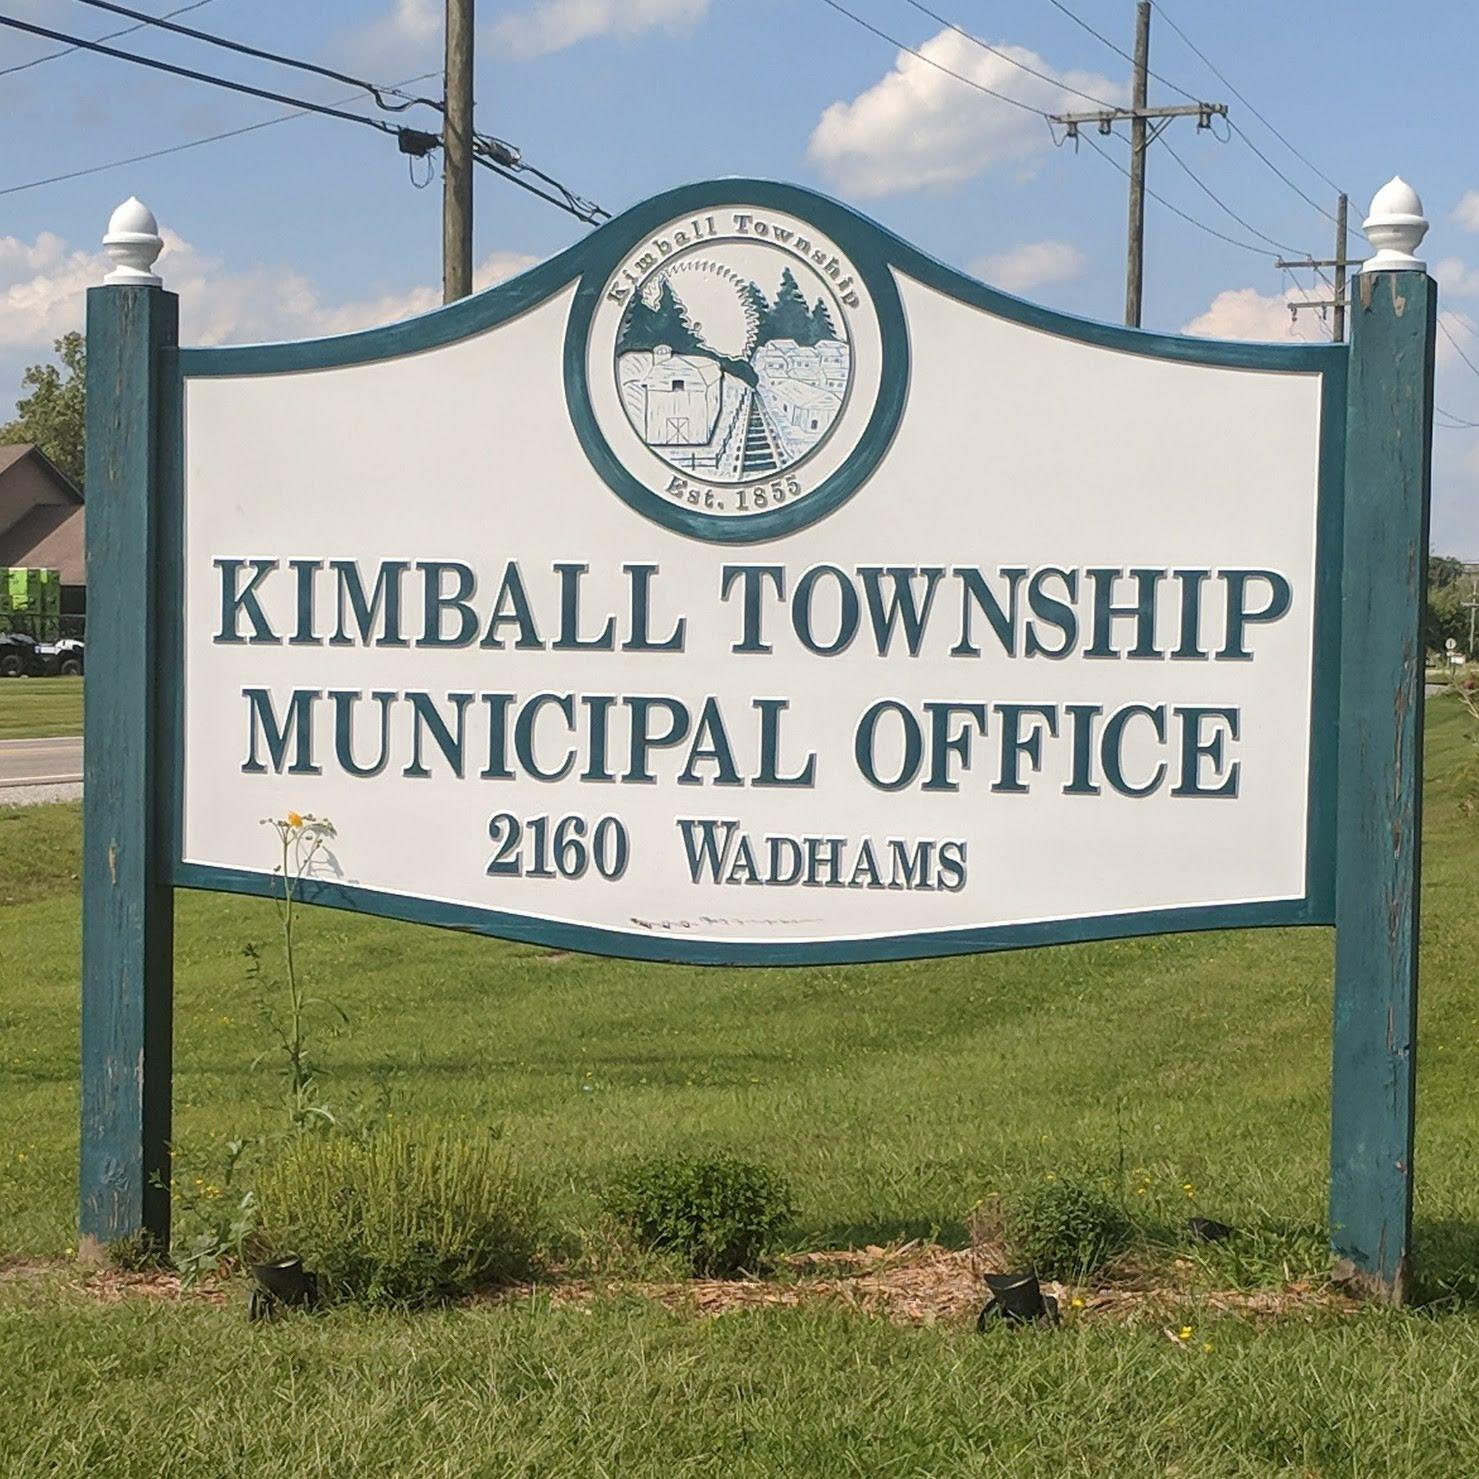 Kimball Township Municipal Office Sign